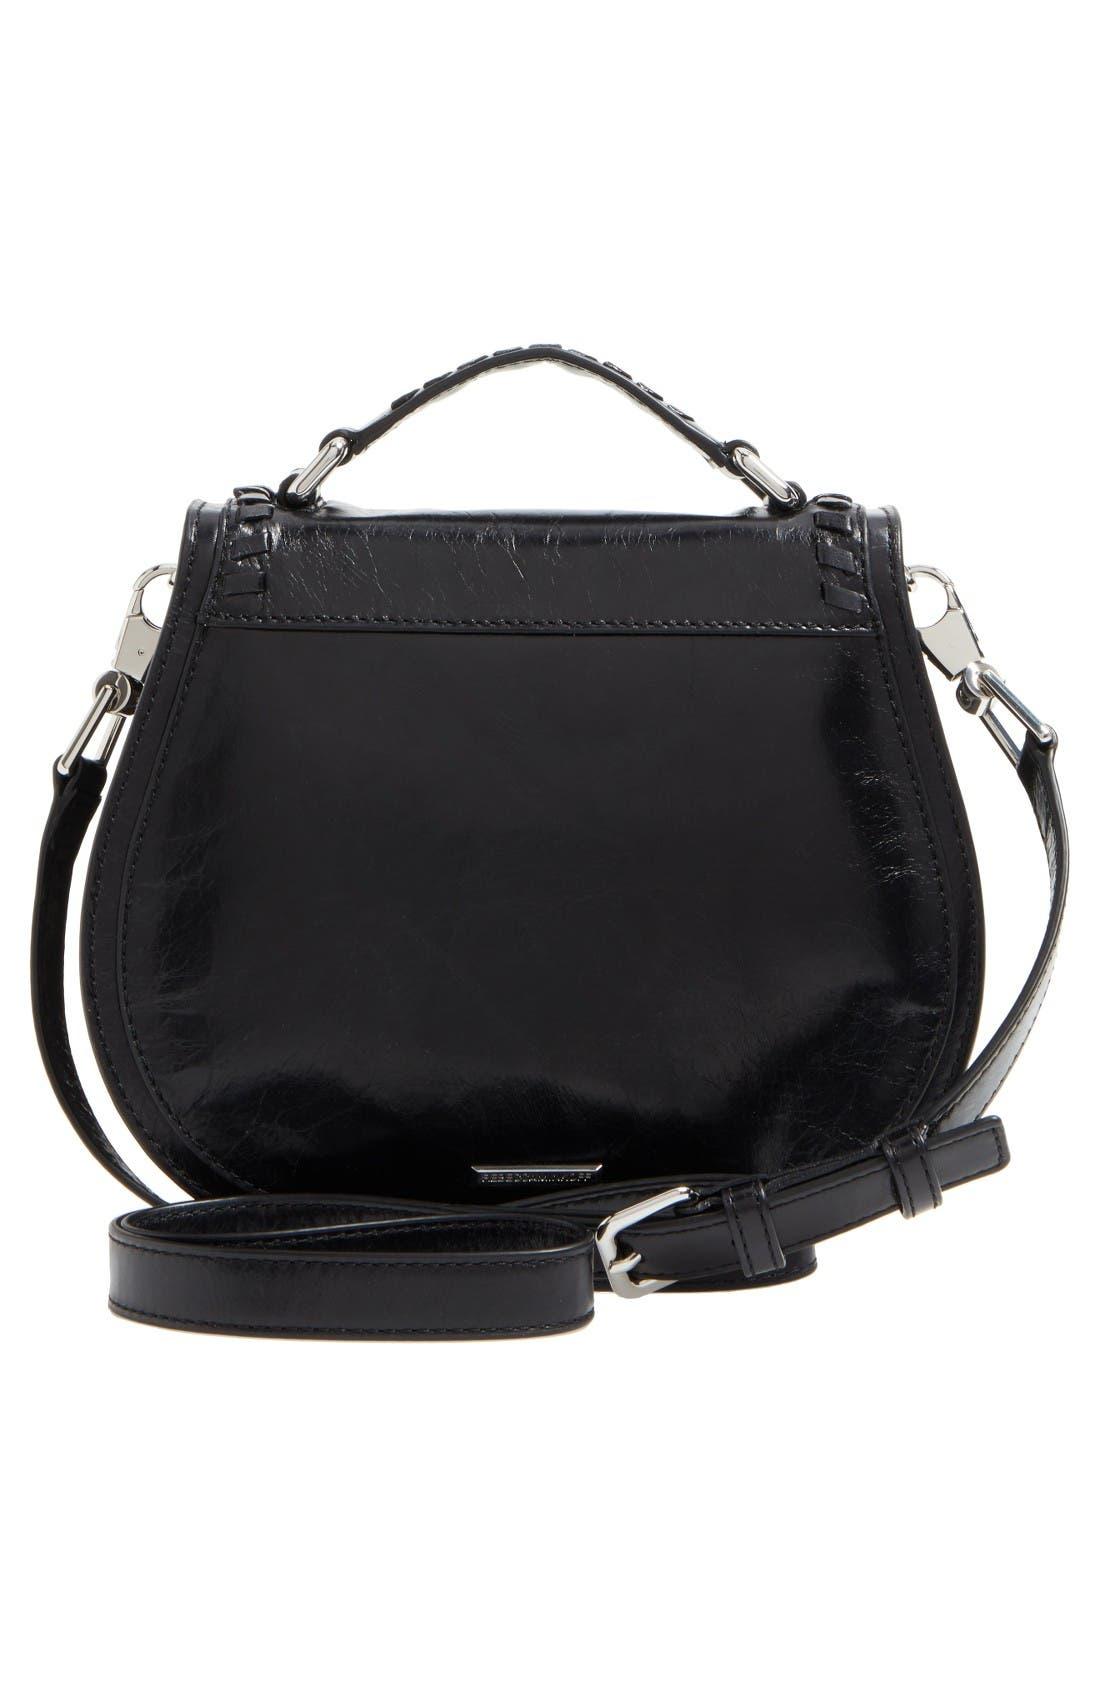 Alternate Image 3  - Rebecca Minkoff Small Vanity Leather Saddle Bag